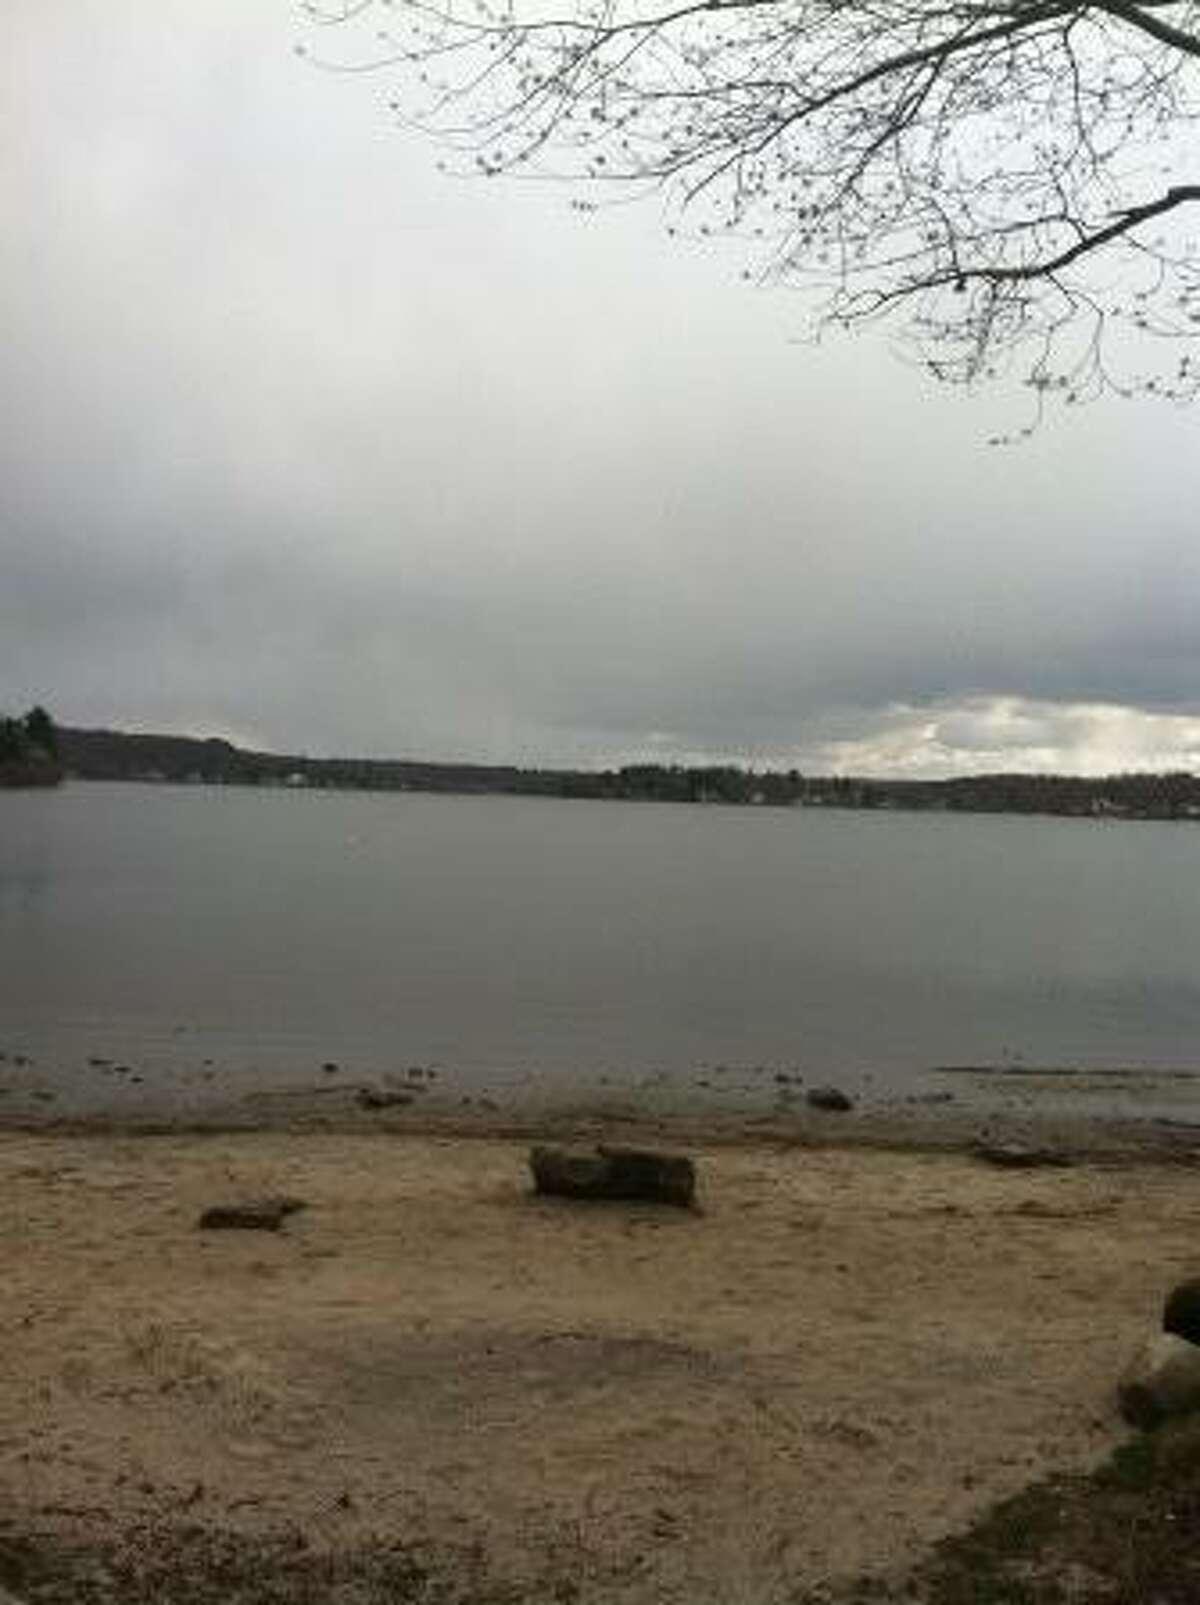 Bantam Lake on Thursday Afternoon. Photo by Daniela Forte.